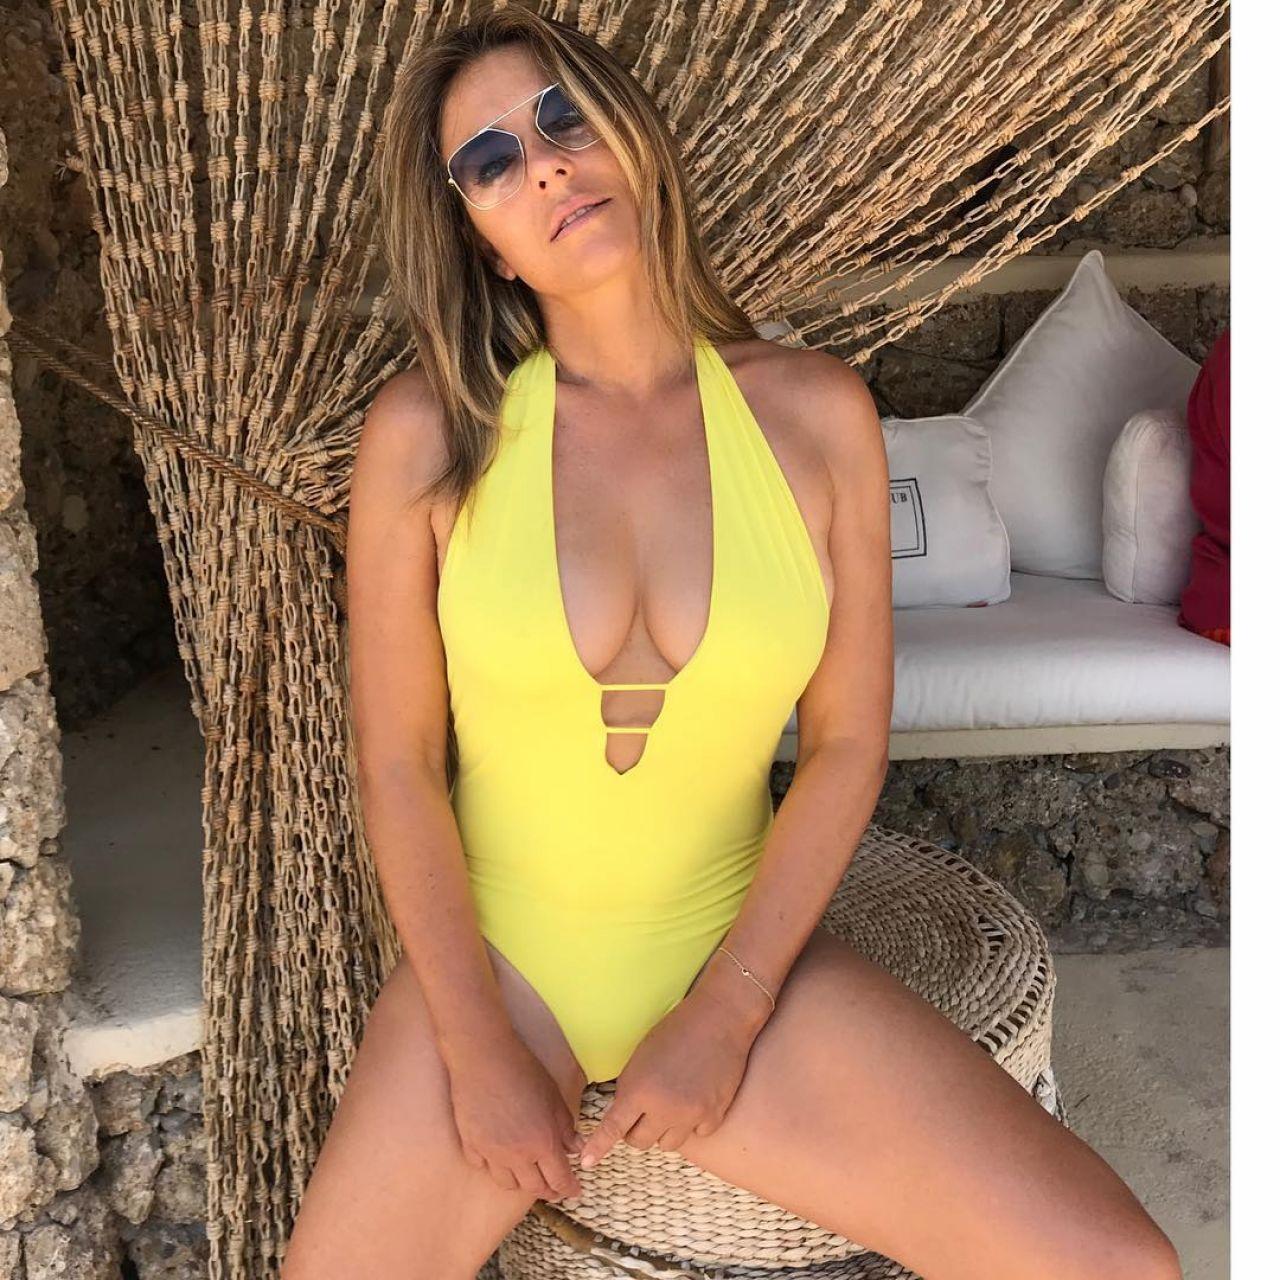 Bikini Elizabeth Hurley naked (92 photo), Ass, Hot, Feet, underwear 2017